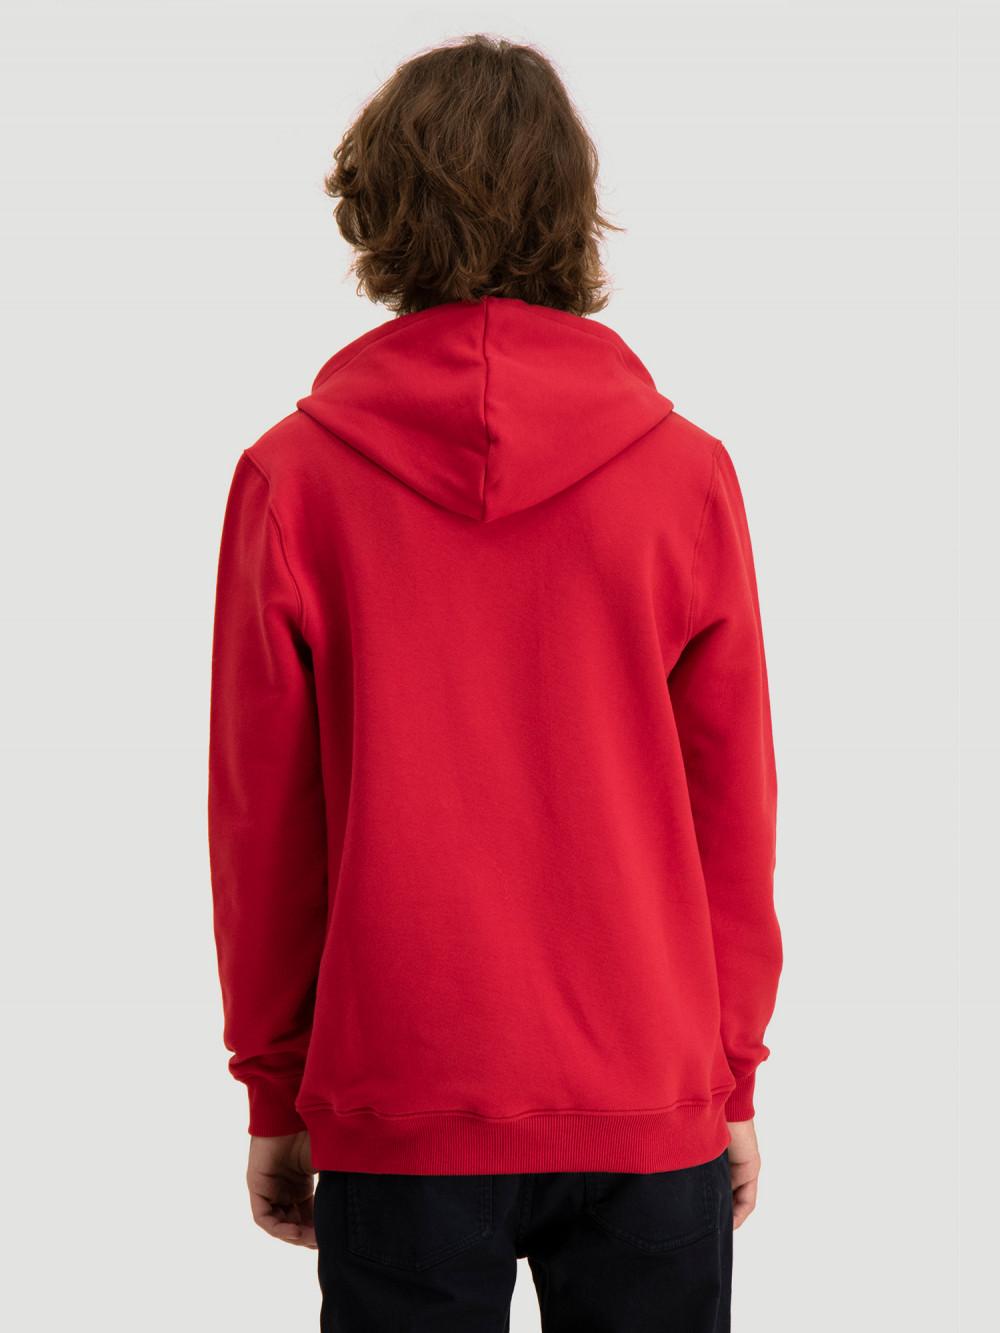 Hanger Sweat, Red